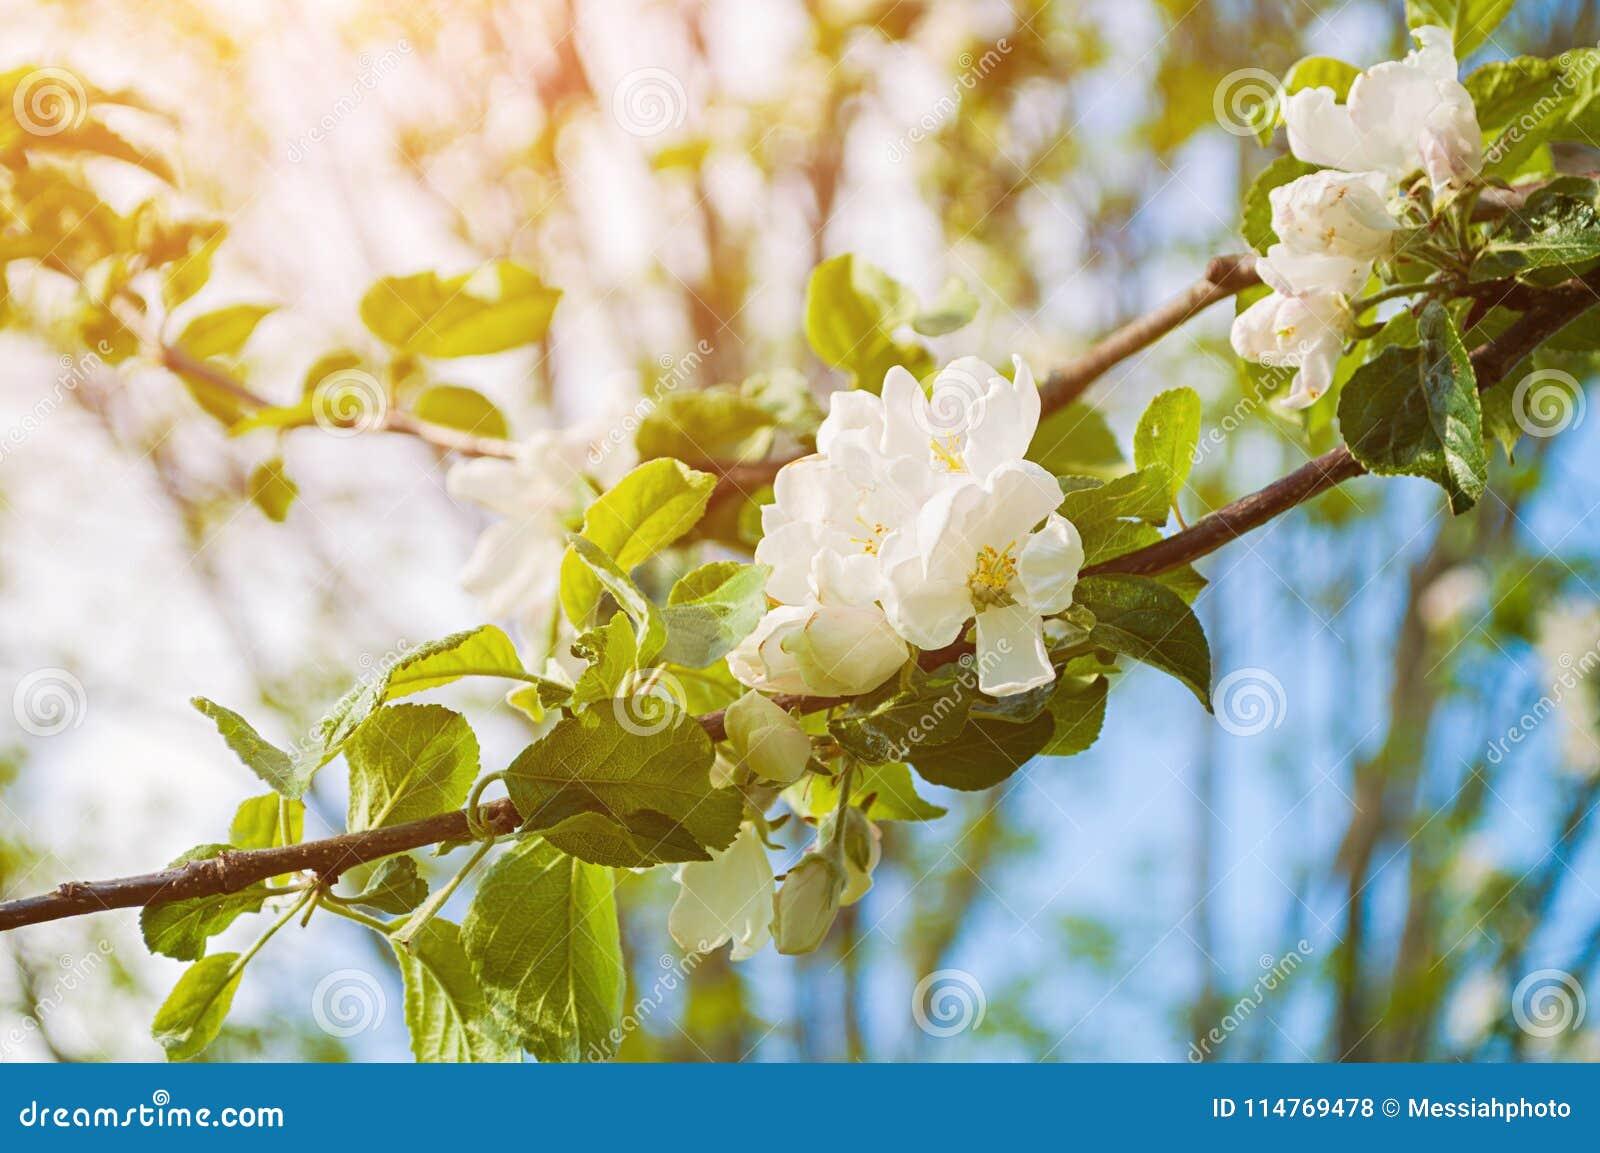 Spring White Flowers Of Blooming Apple Tree Spring Flower